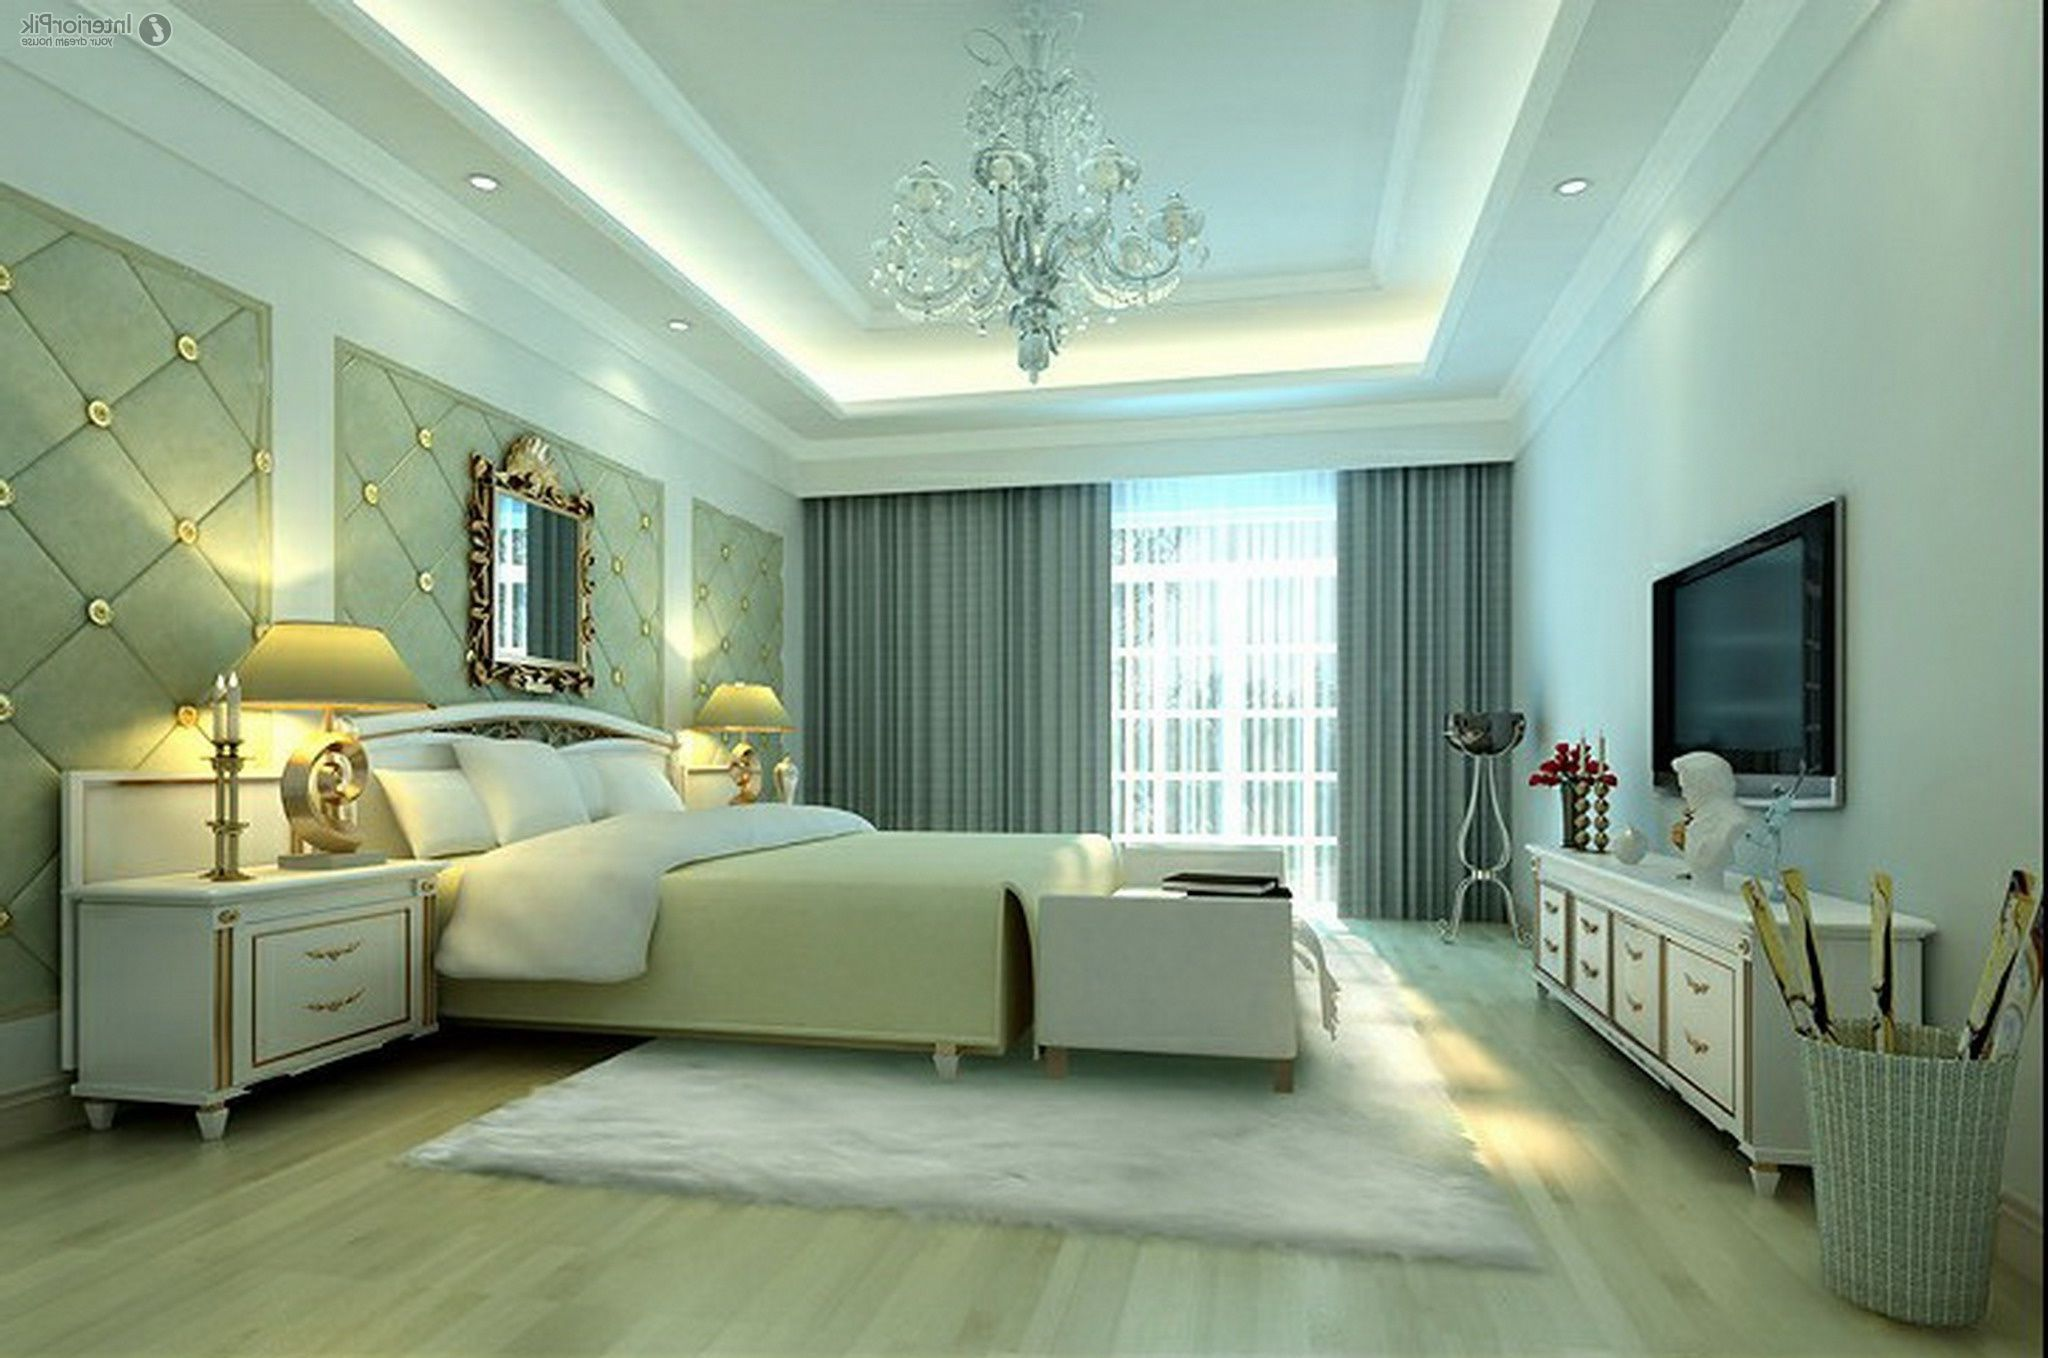 A Guide In Selecting The Best Bedroom Lighting Fixtures False Ceiling Bedroom Ceiling Design Modern False Ceiling